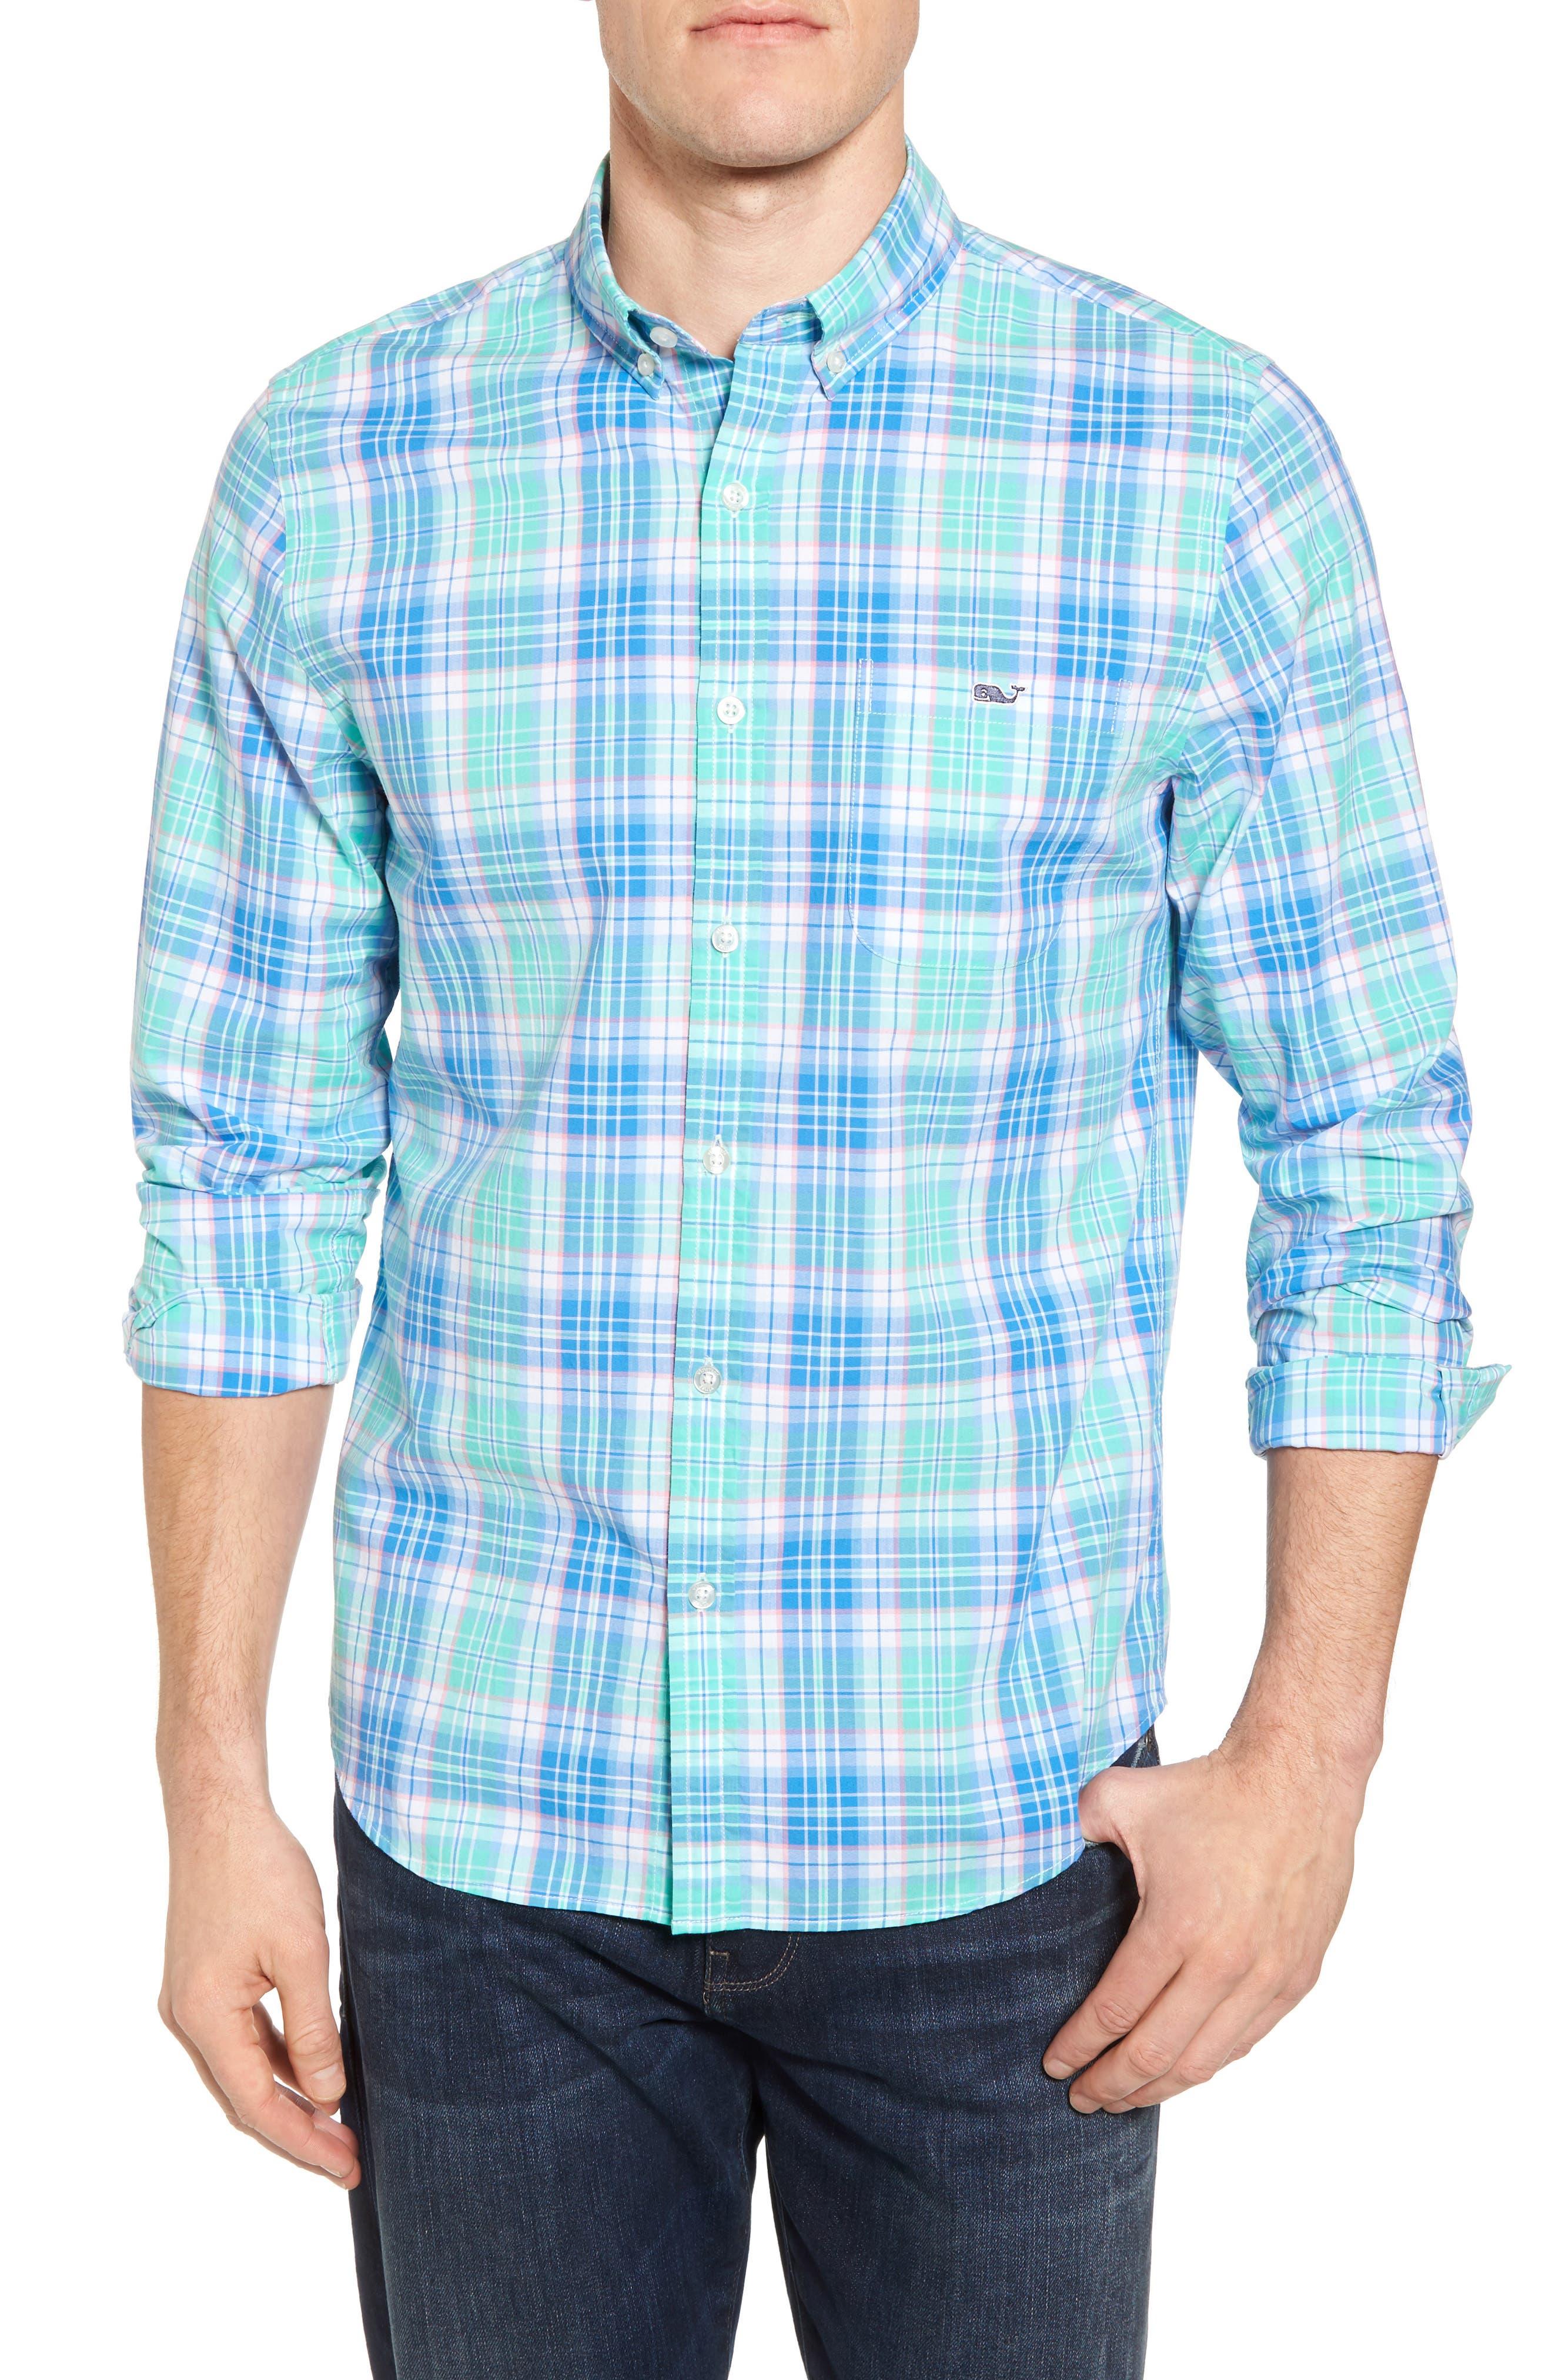 Sutherland Road Slim Fit Plaid Sport Shirt,                             Main thumbnail 1, color,                             Antigua Green